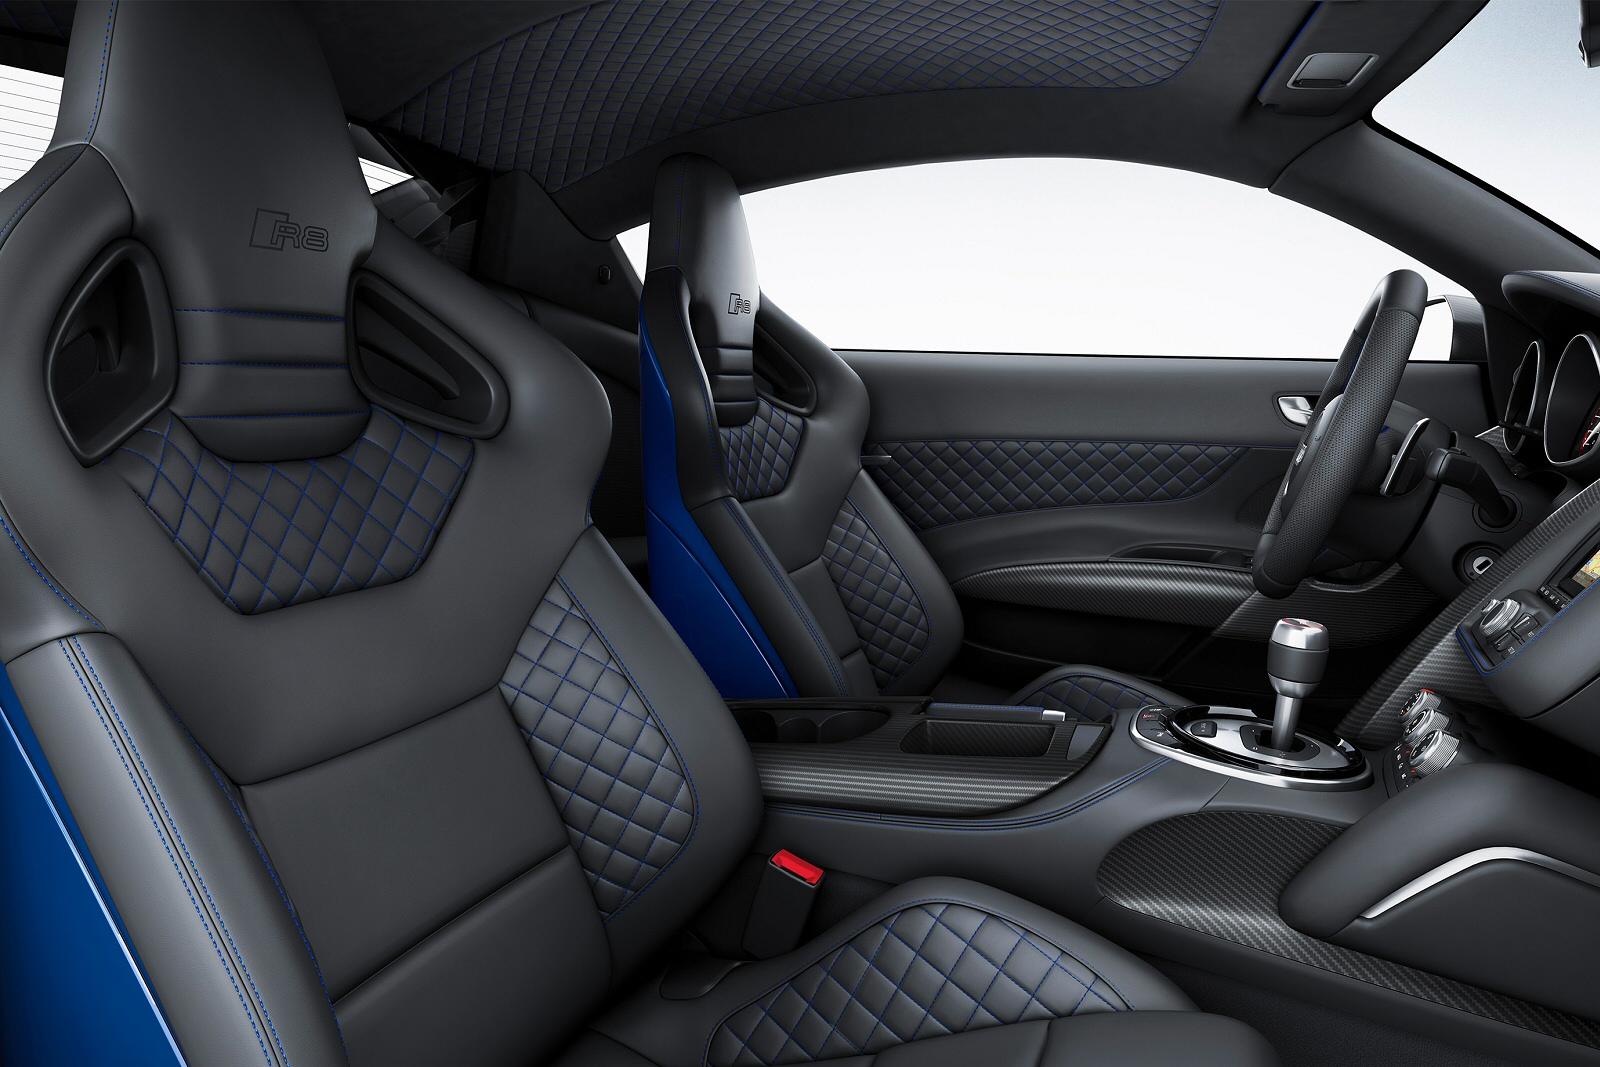 Très New Audi R8 5.2 Fsi V10 Plus Quattro 2Dr S Tronic Petrol Coupe for  EW67